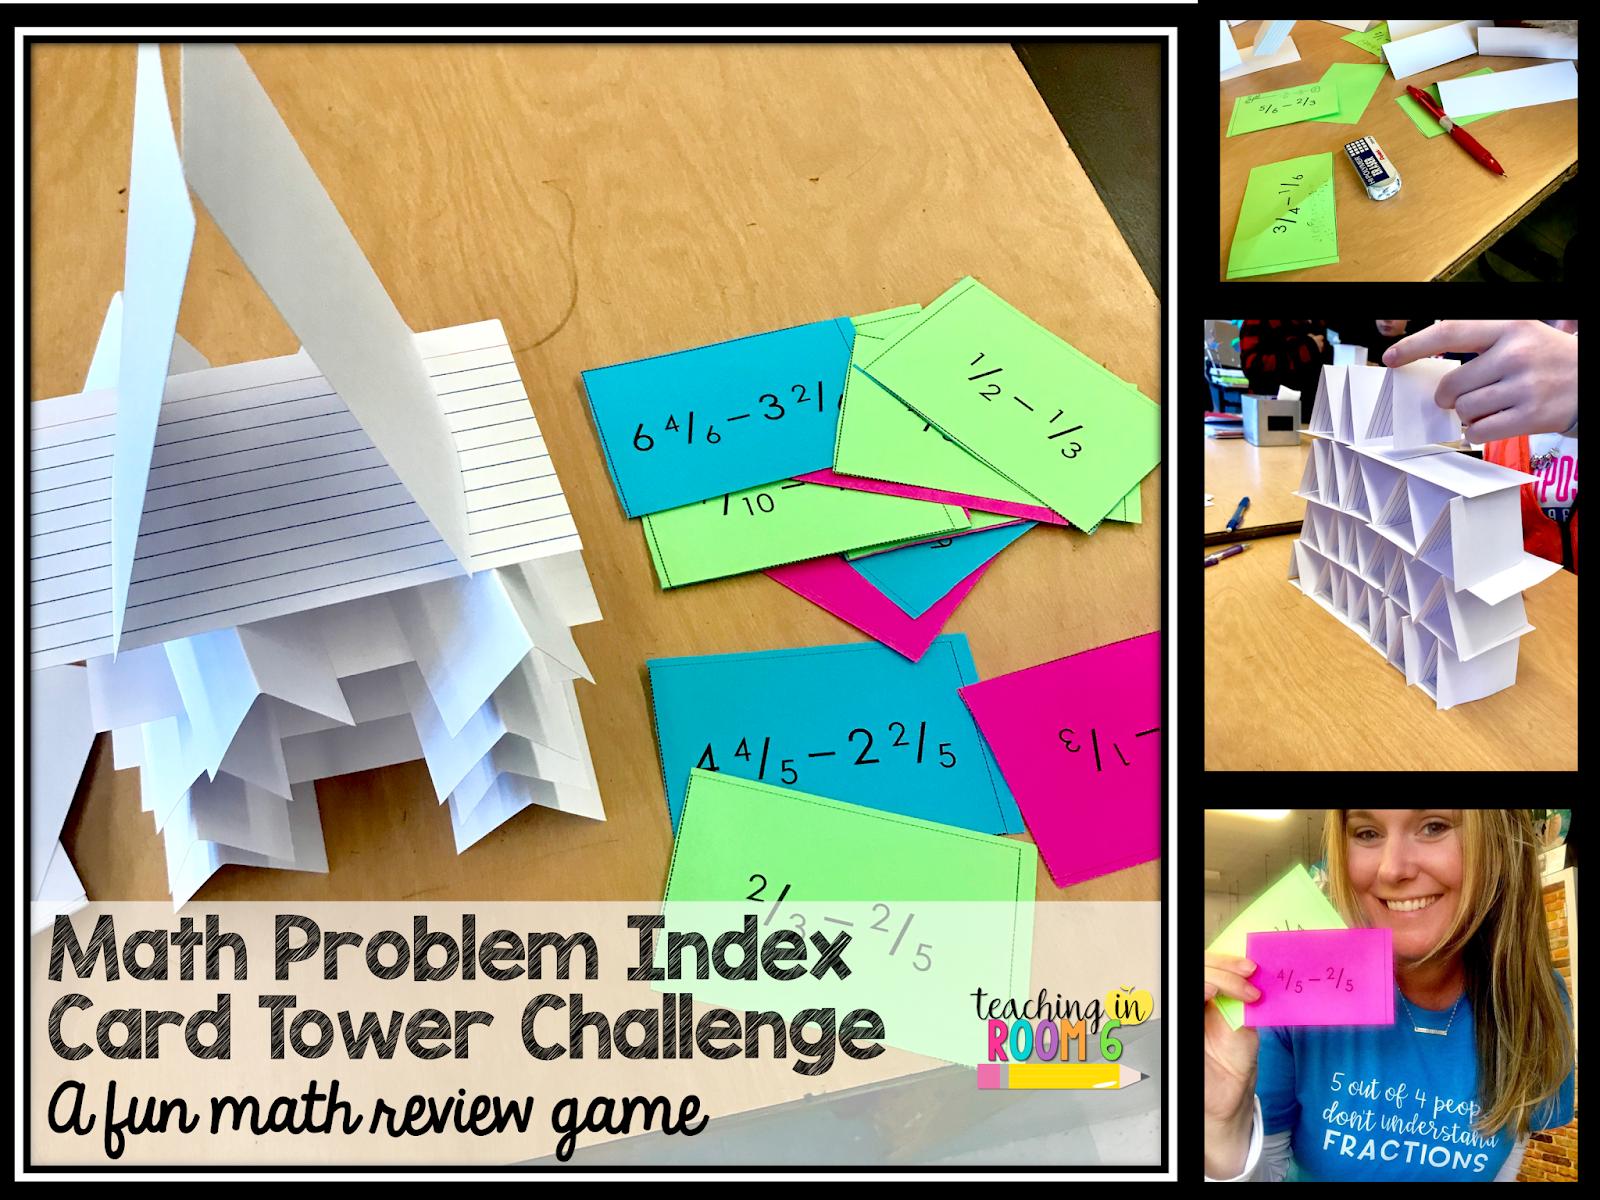 Teaching in Room 6: Math Problem Index Card Tower: A FUN